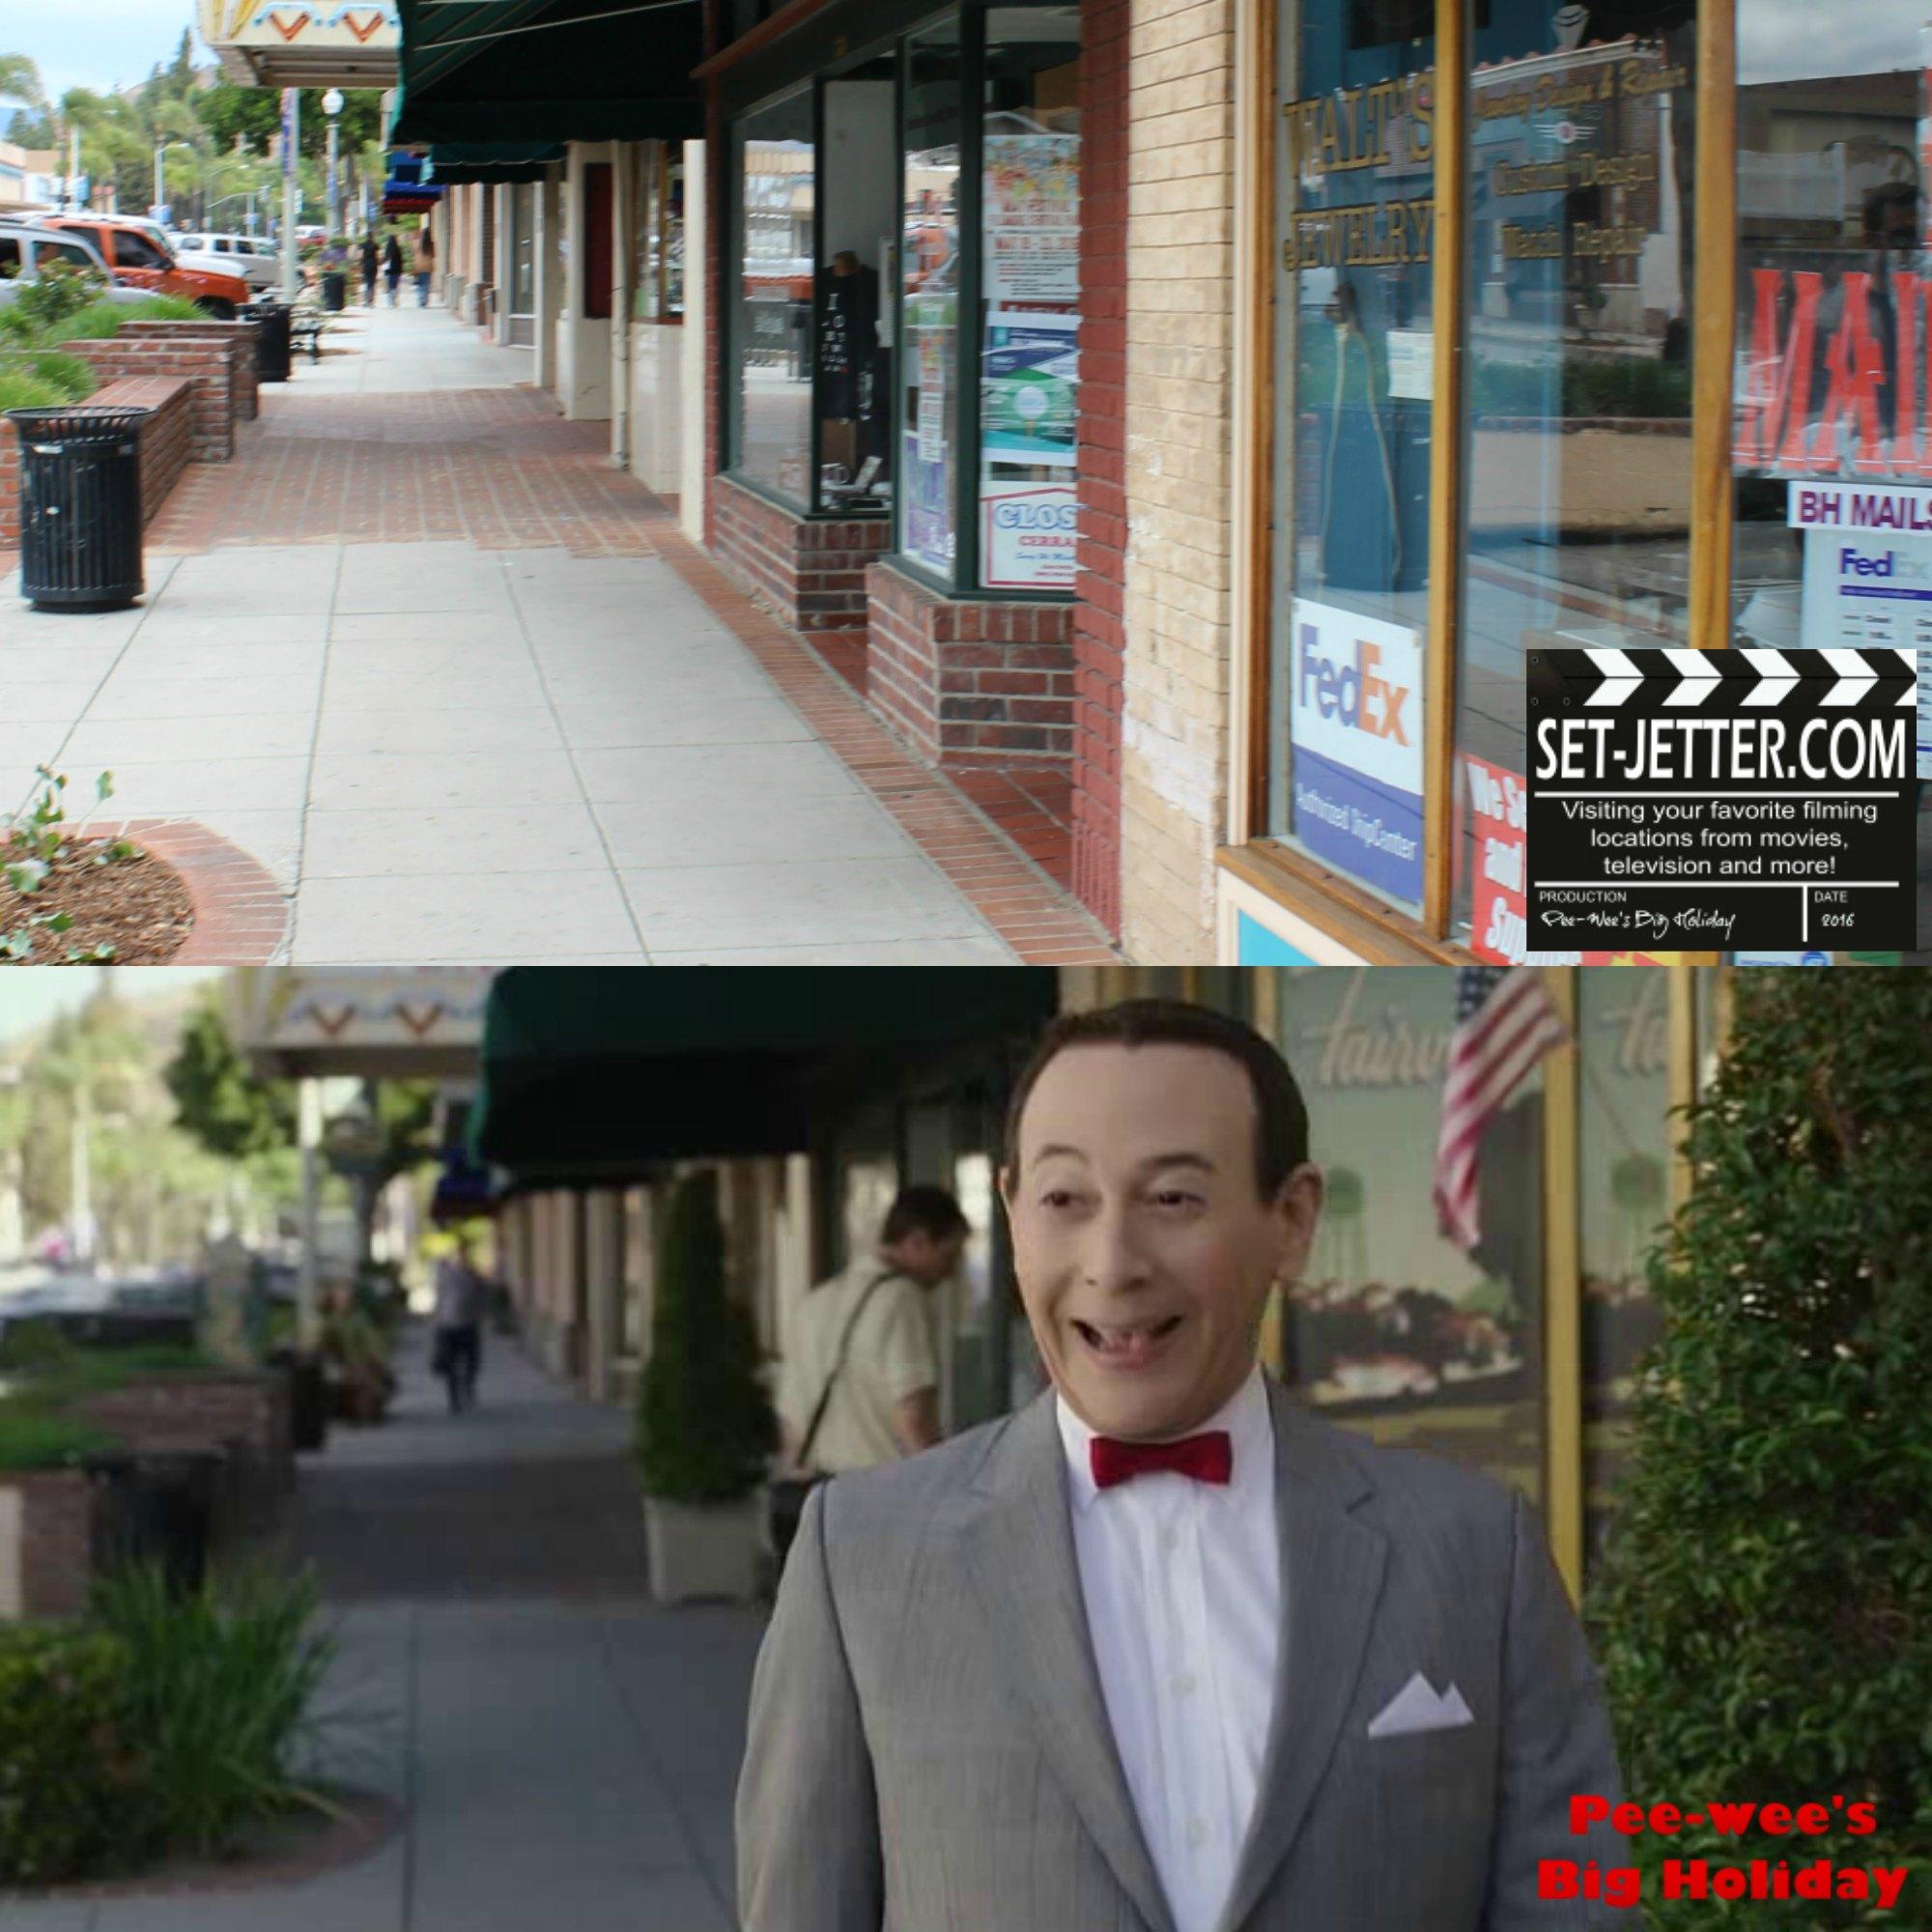 Pee Wee's Big Holiday comparison 262.jpg